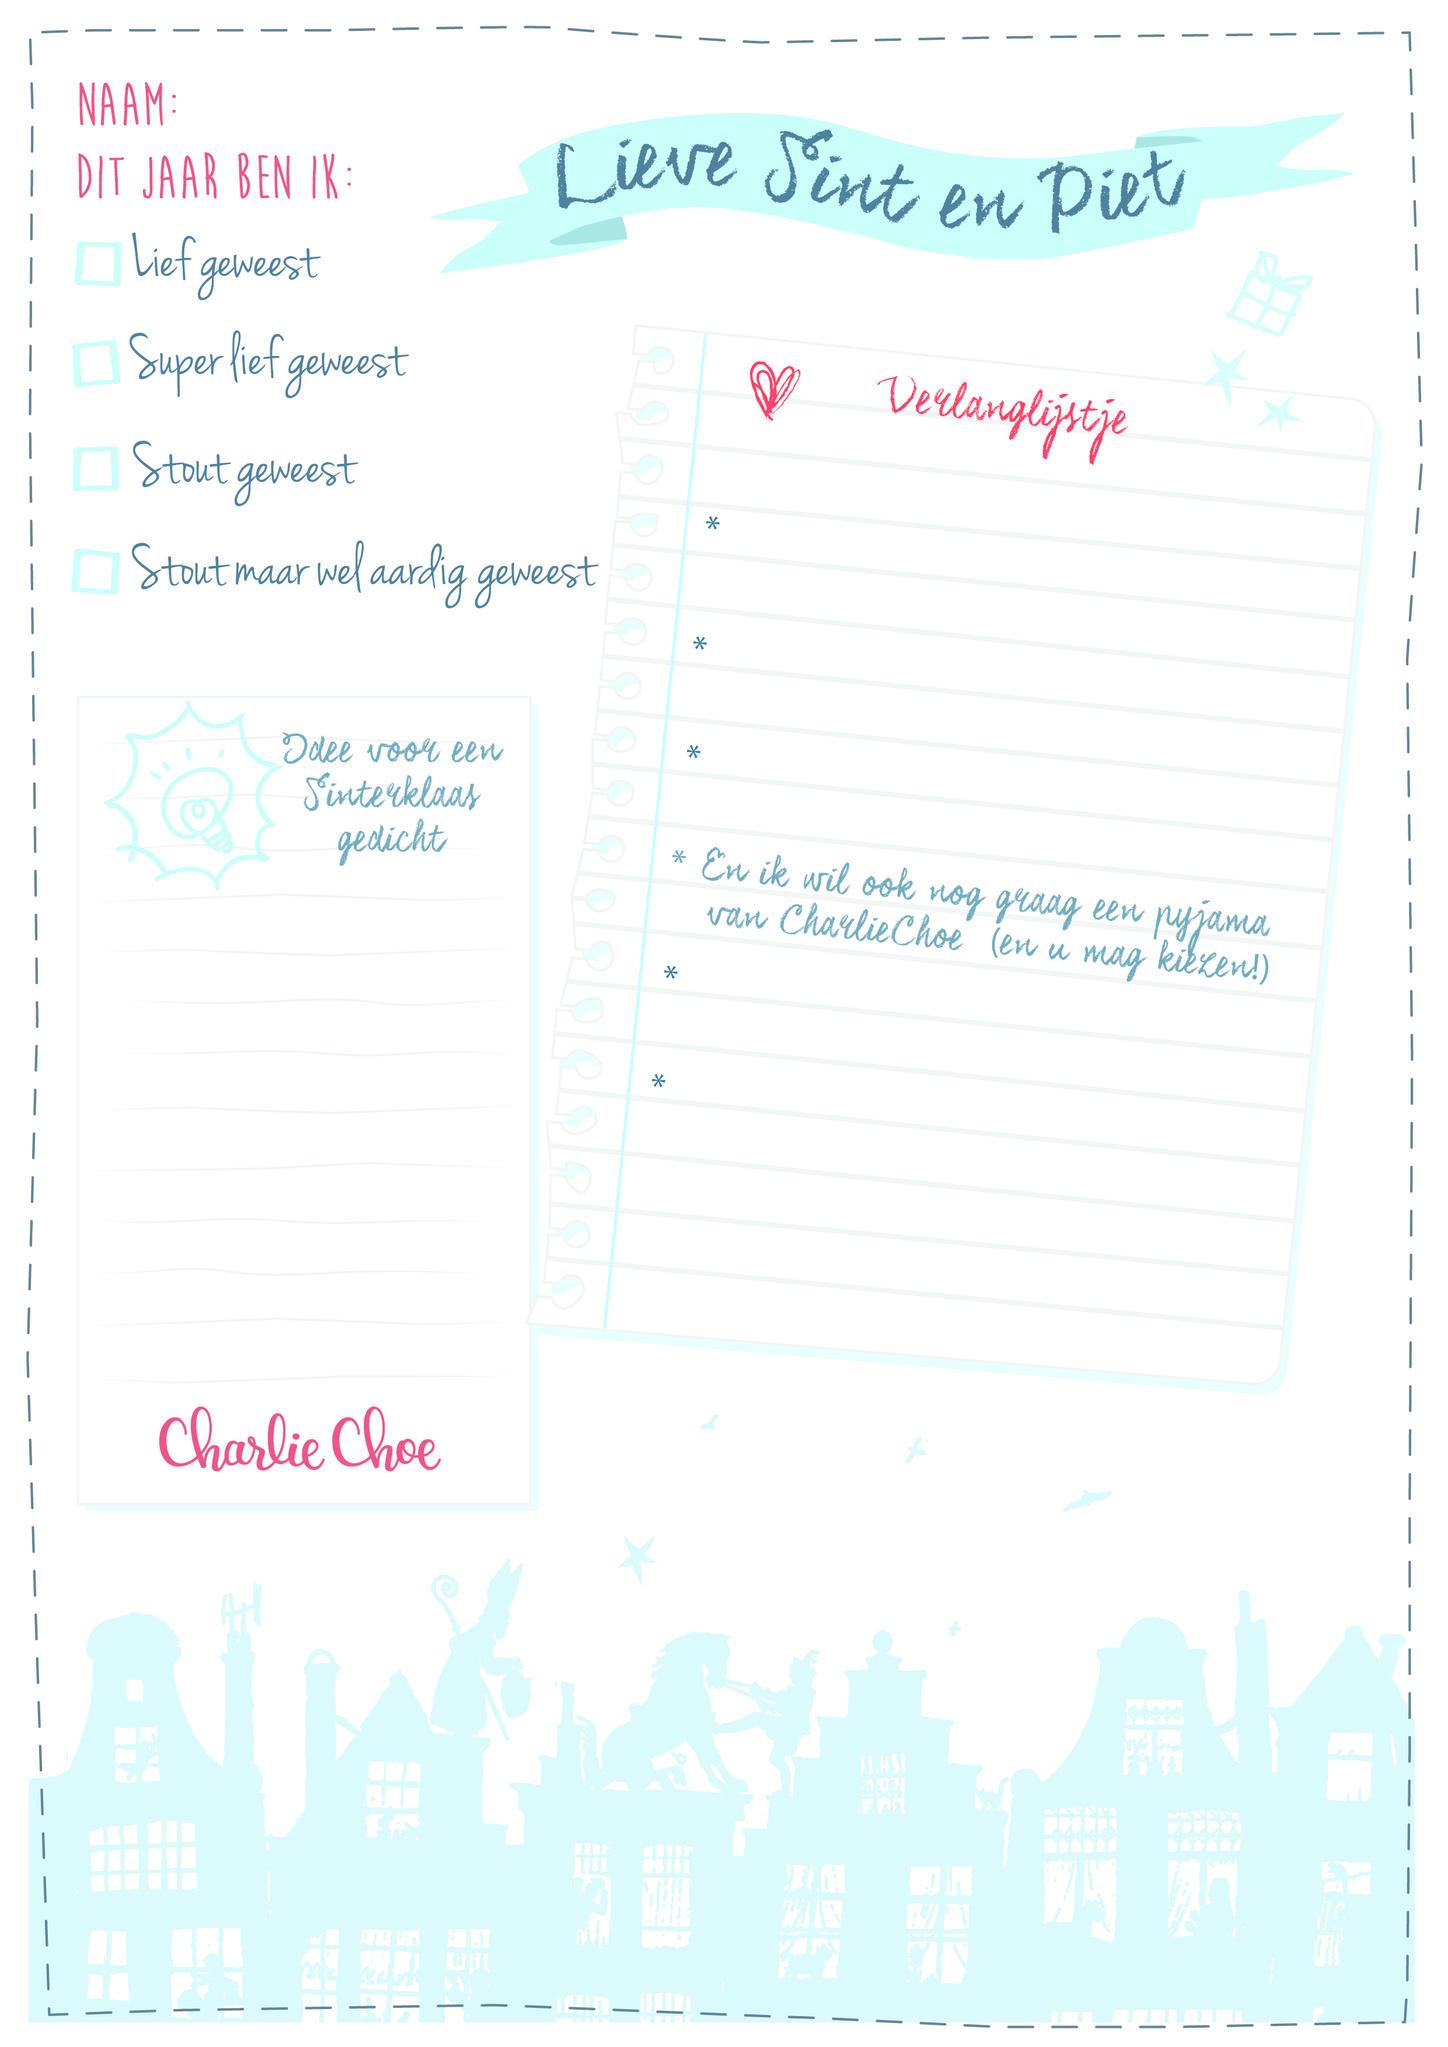 Vaak Blog - Verlanglijstje Sinterklaas - Charlie Choe #DA36